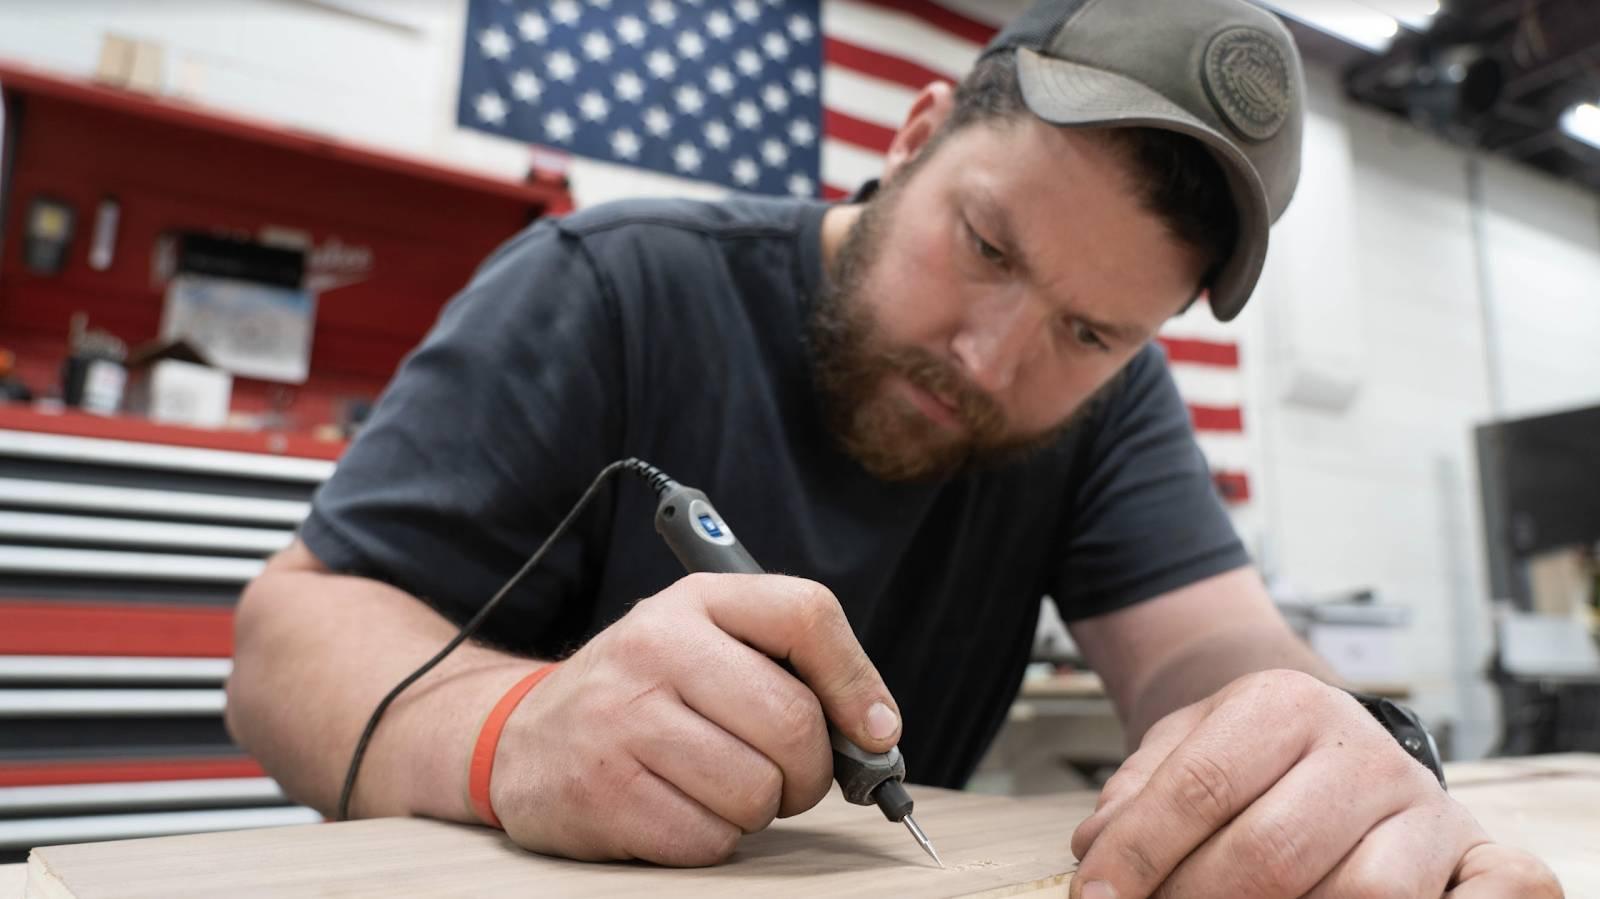 John Malecki uses the DREMEL Stylo+ Versatile Craft Tool on wood